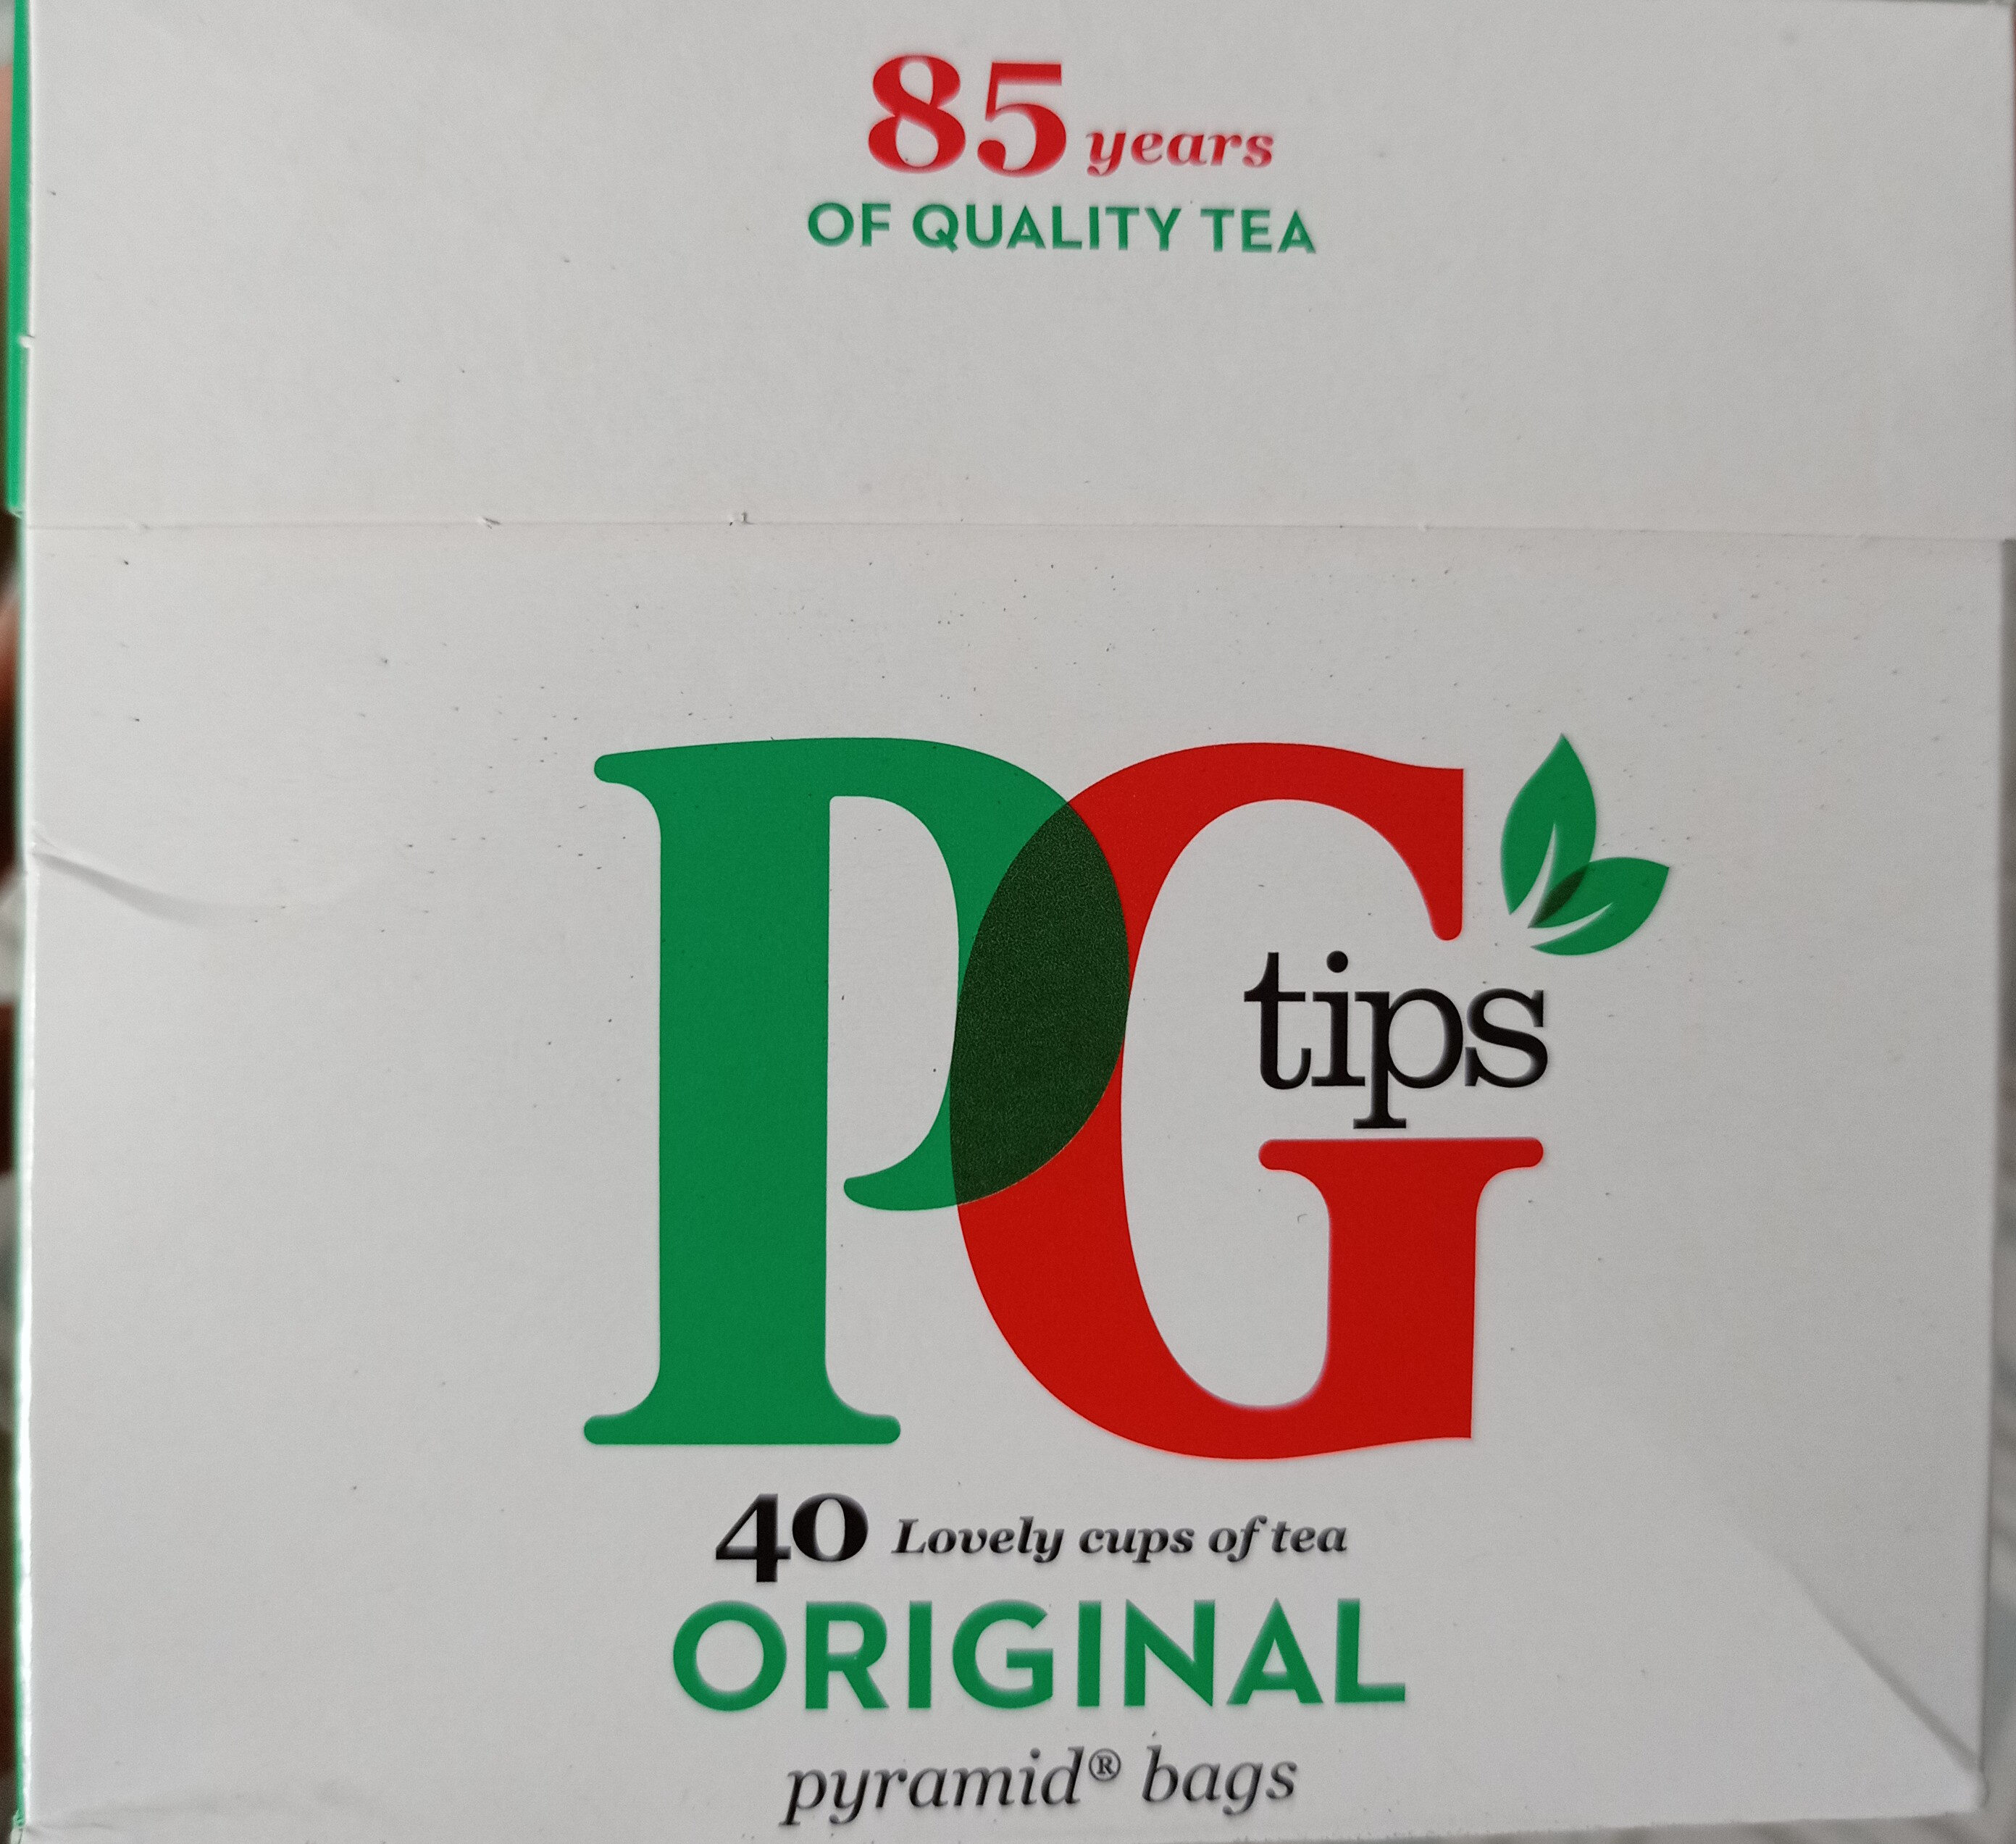 PG tips - Product - en